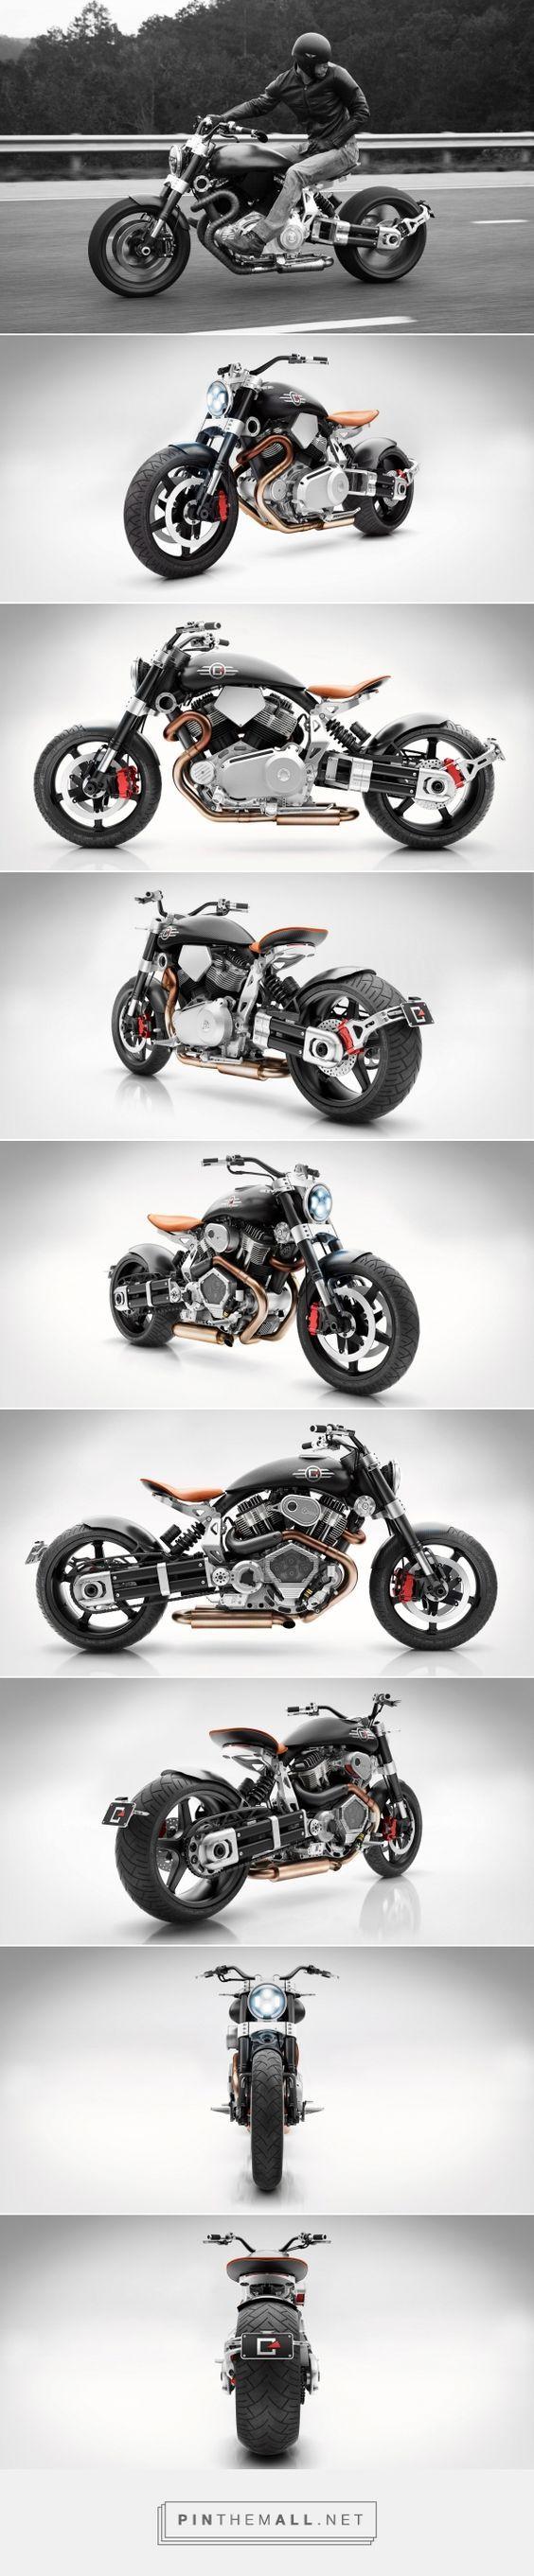 Hellcat | Confederate Motorcycles